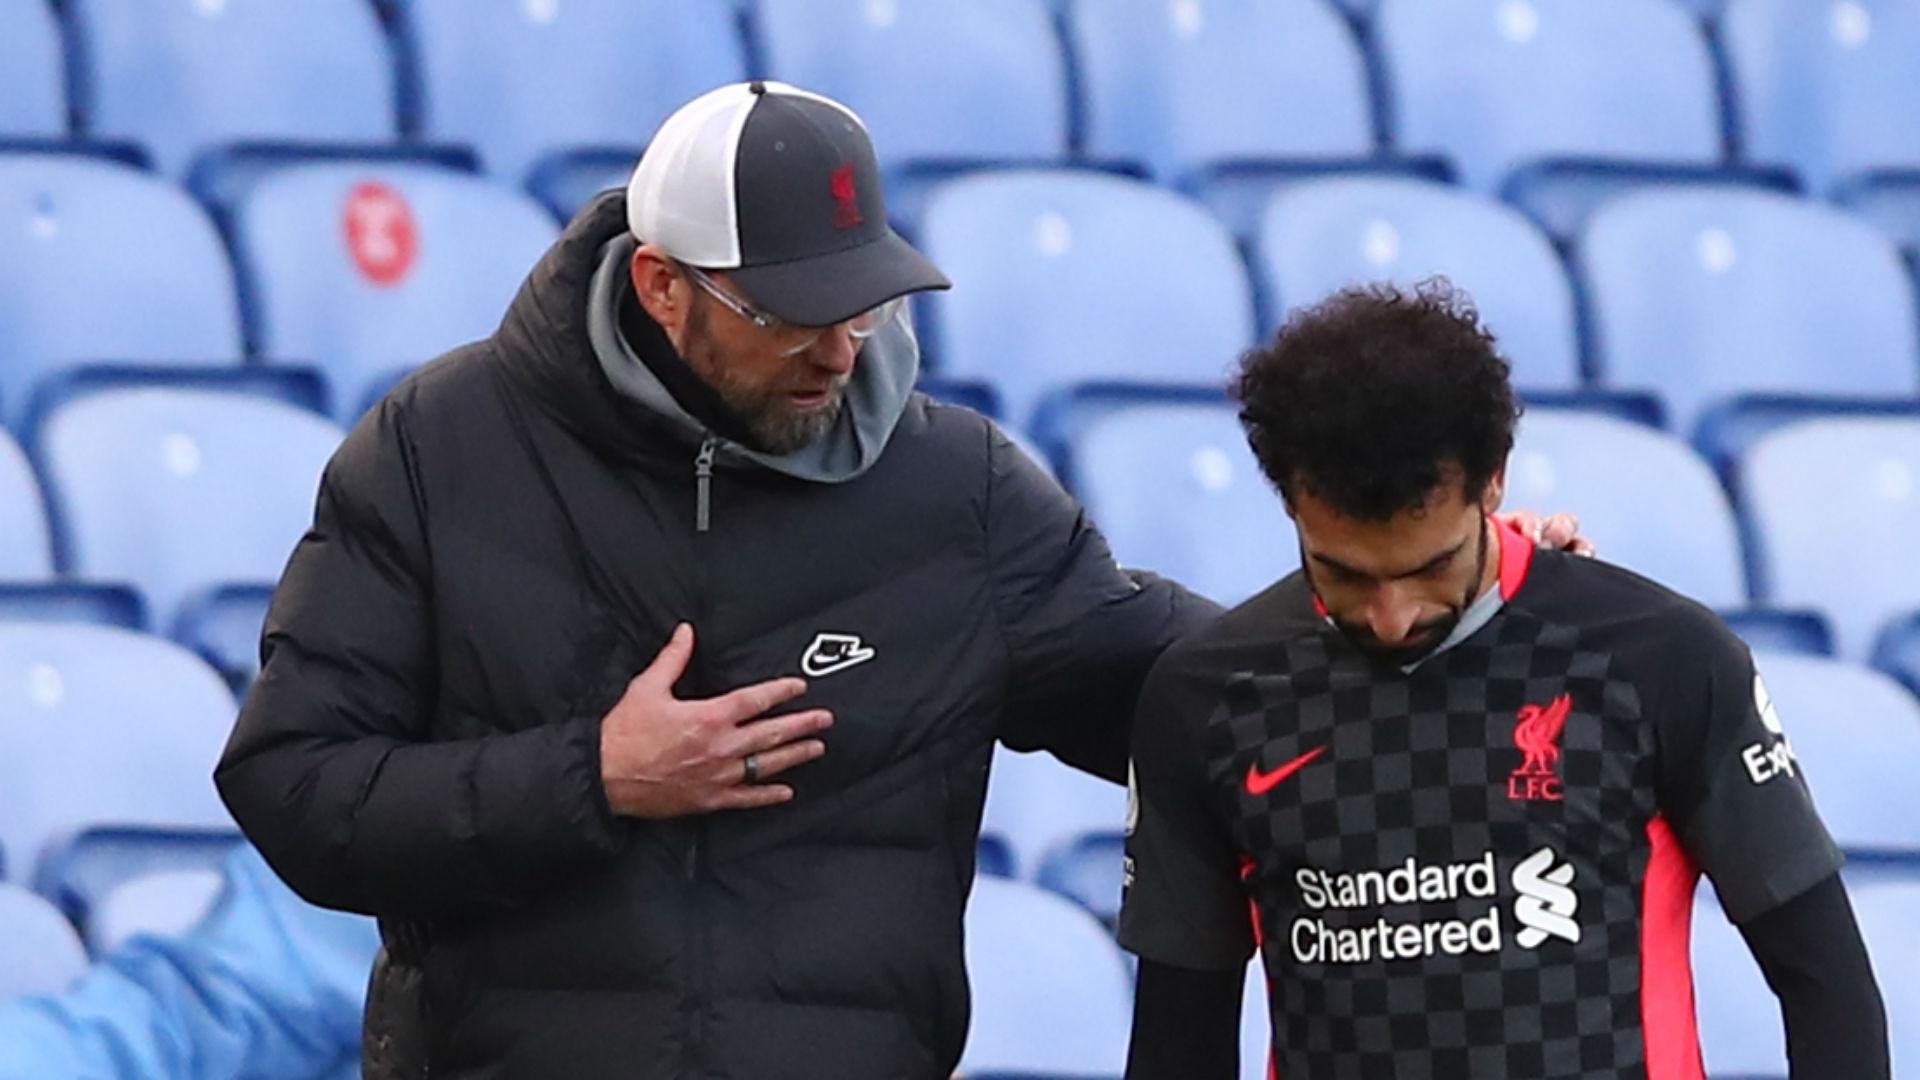 No concerns over Salah's future at Liverpool, says Klopp